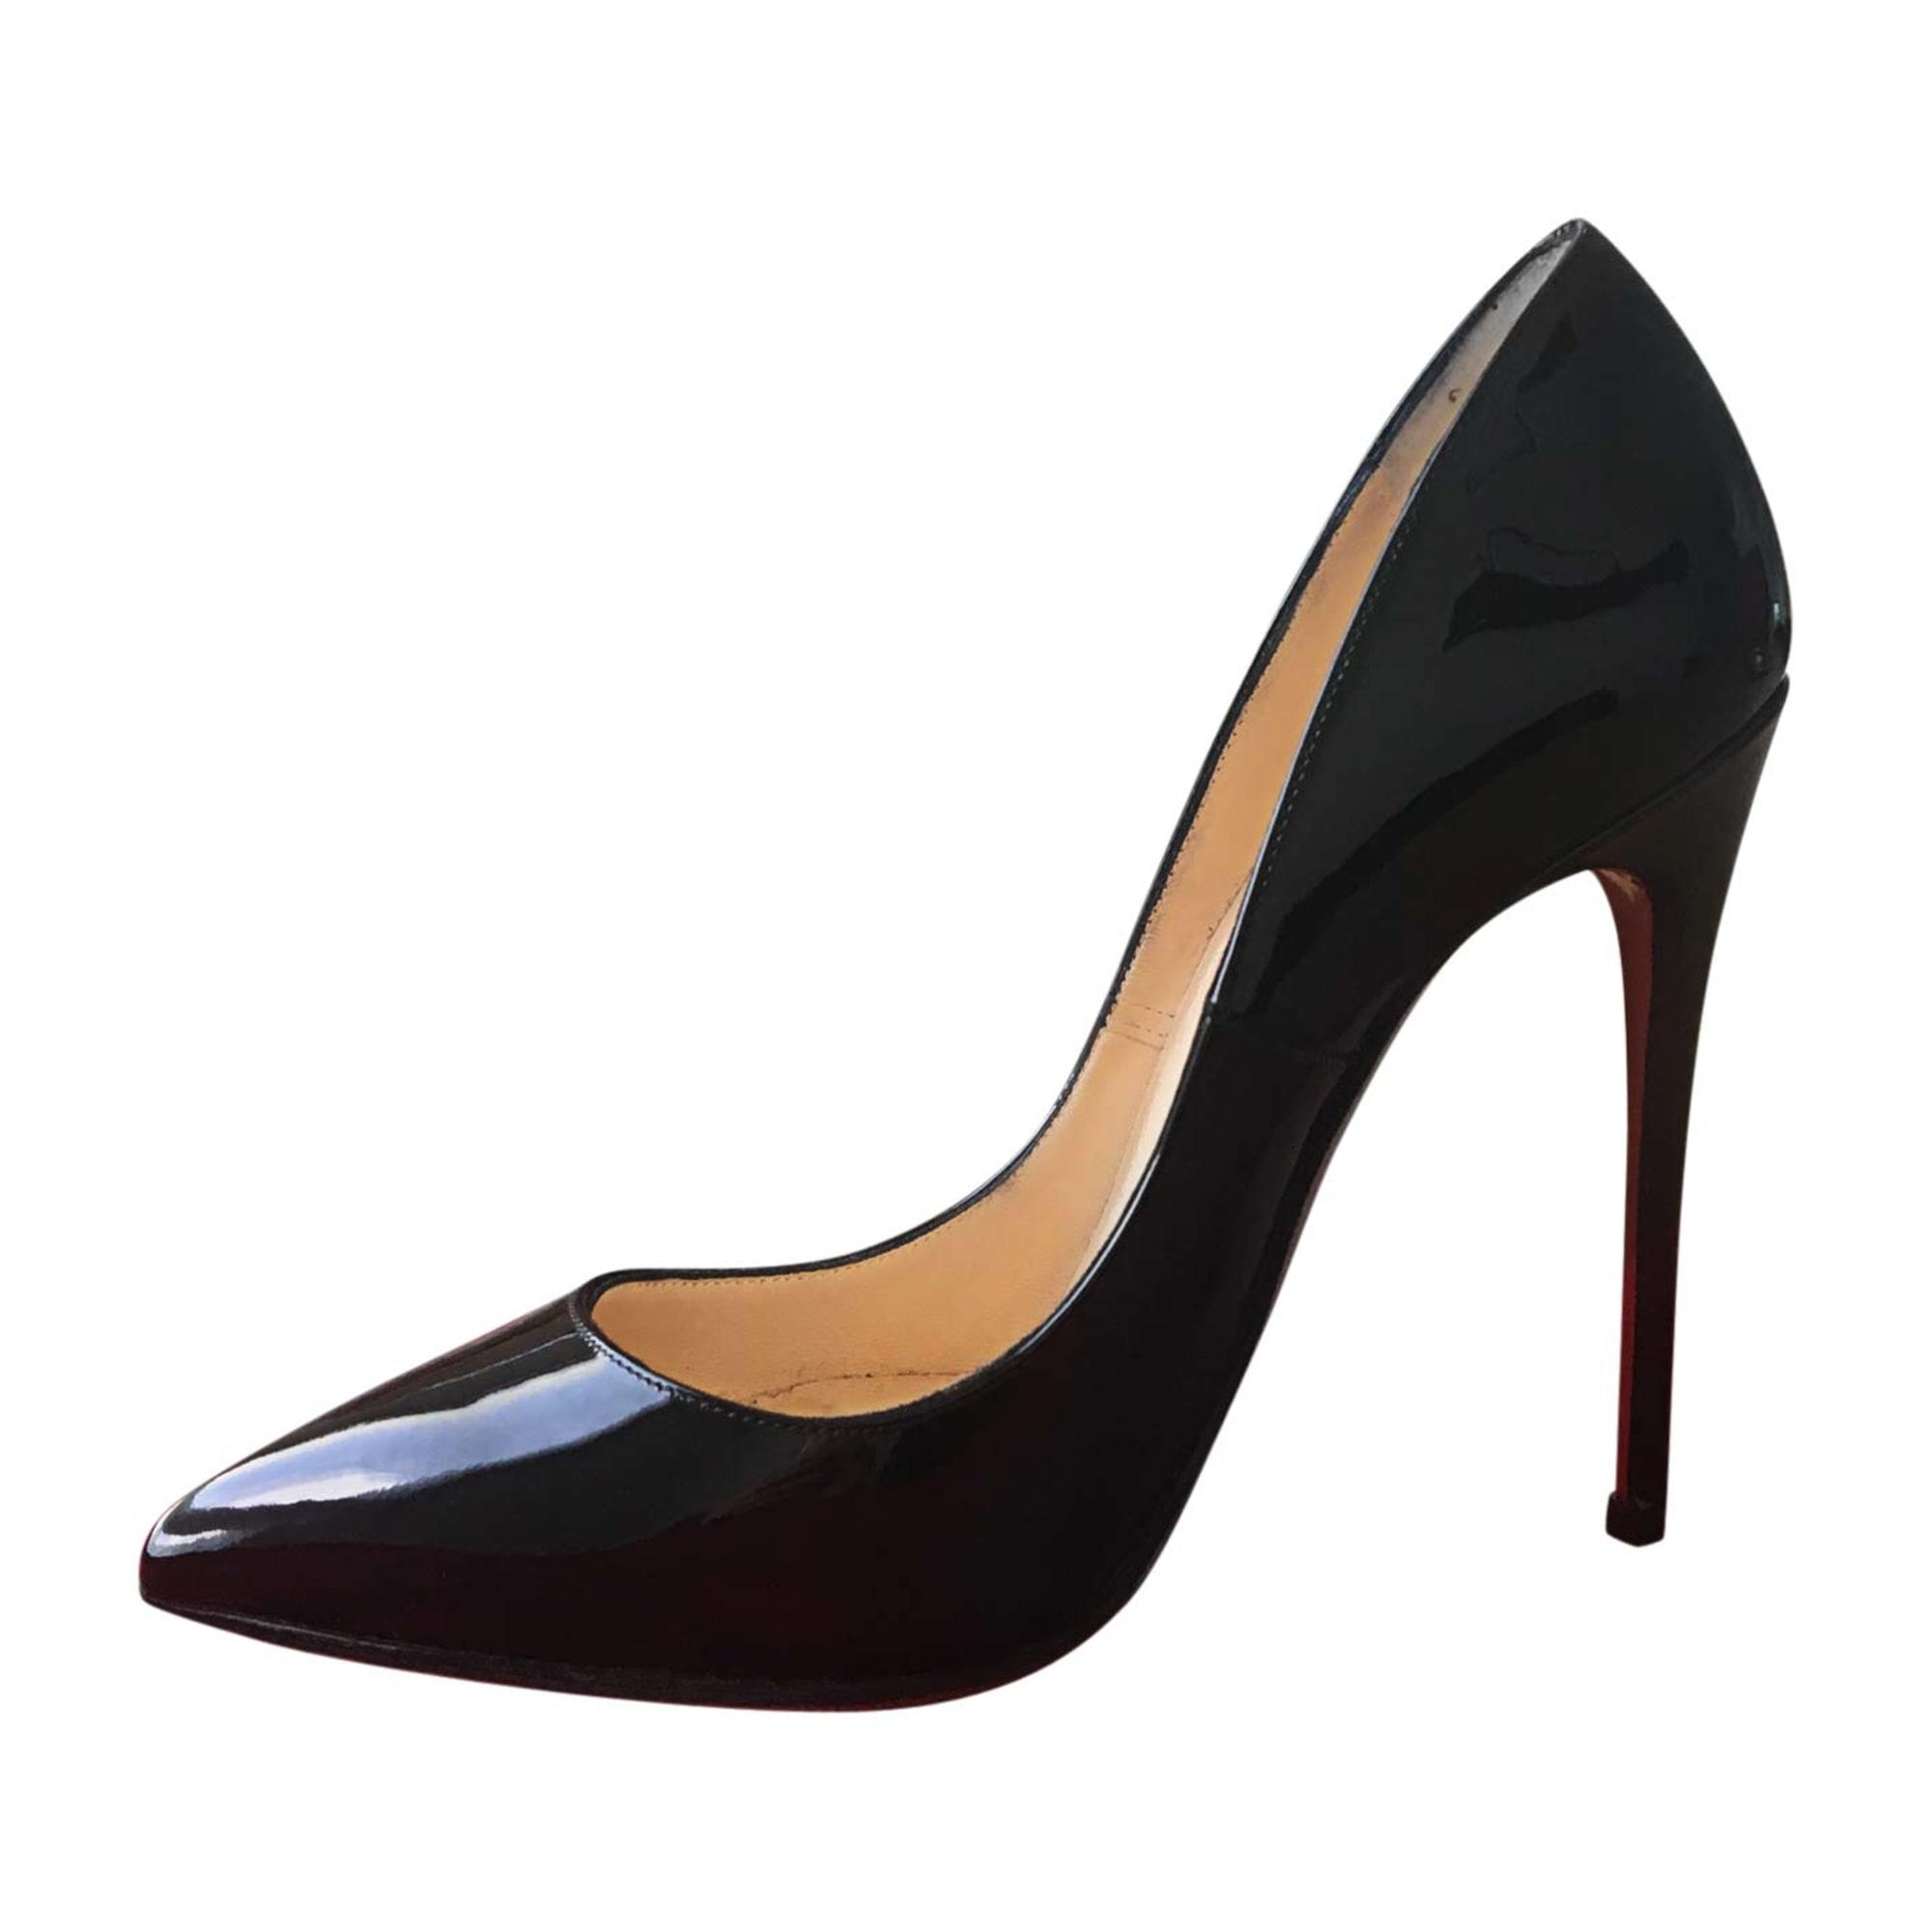 chaussure louboutin femme lyon